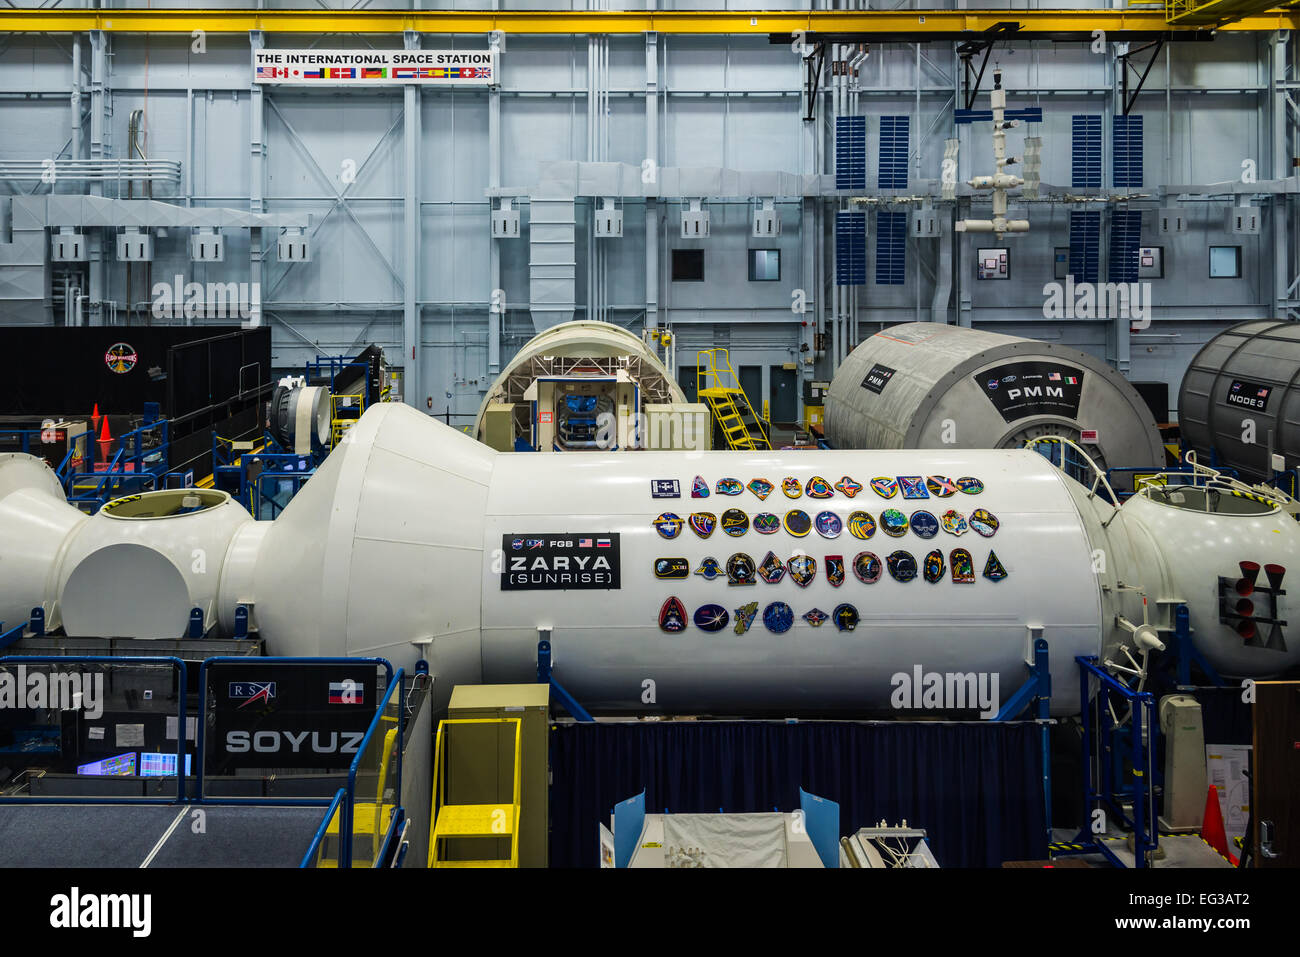 Simulator of the Russian Soyuz module on the International Space Station. NASA Johnson Space Center, Houston, Texas, - Stock Image